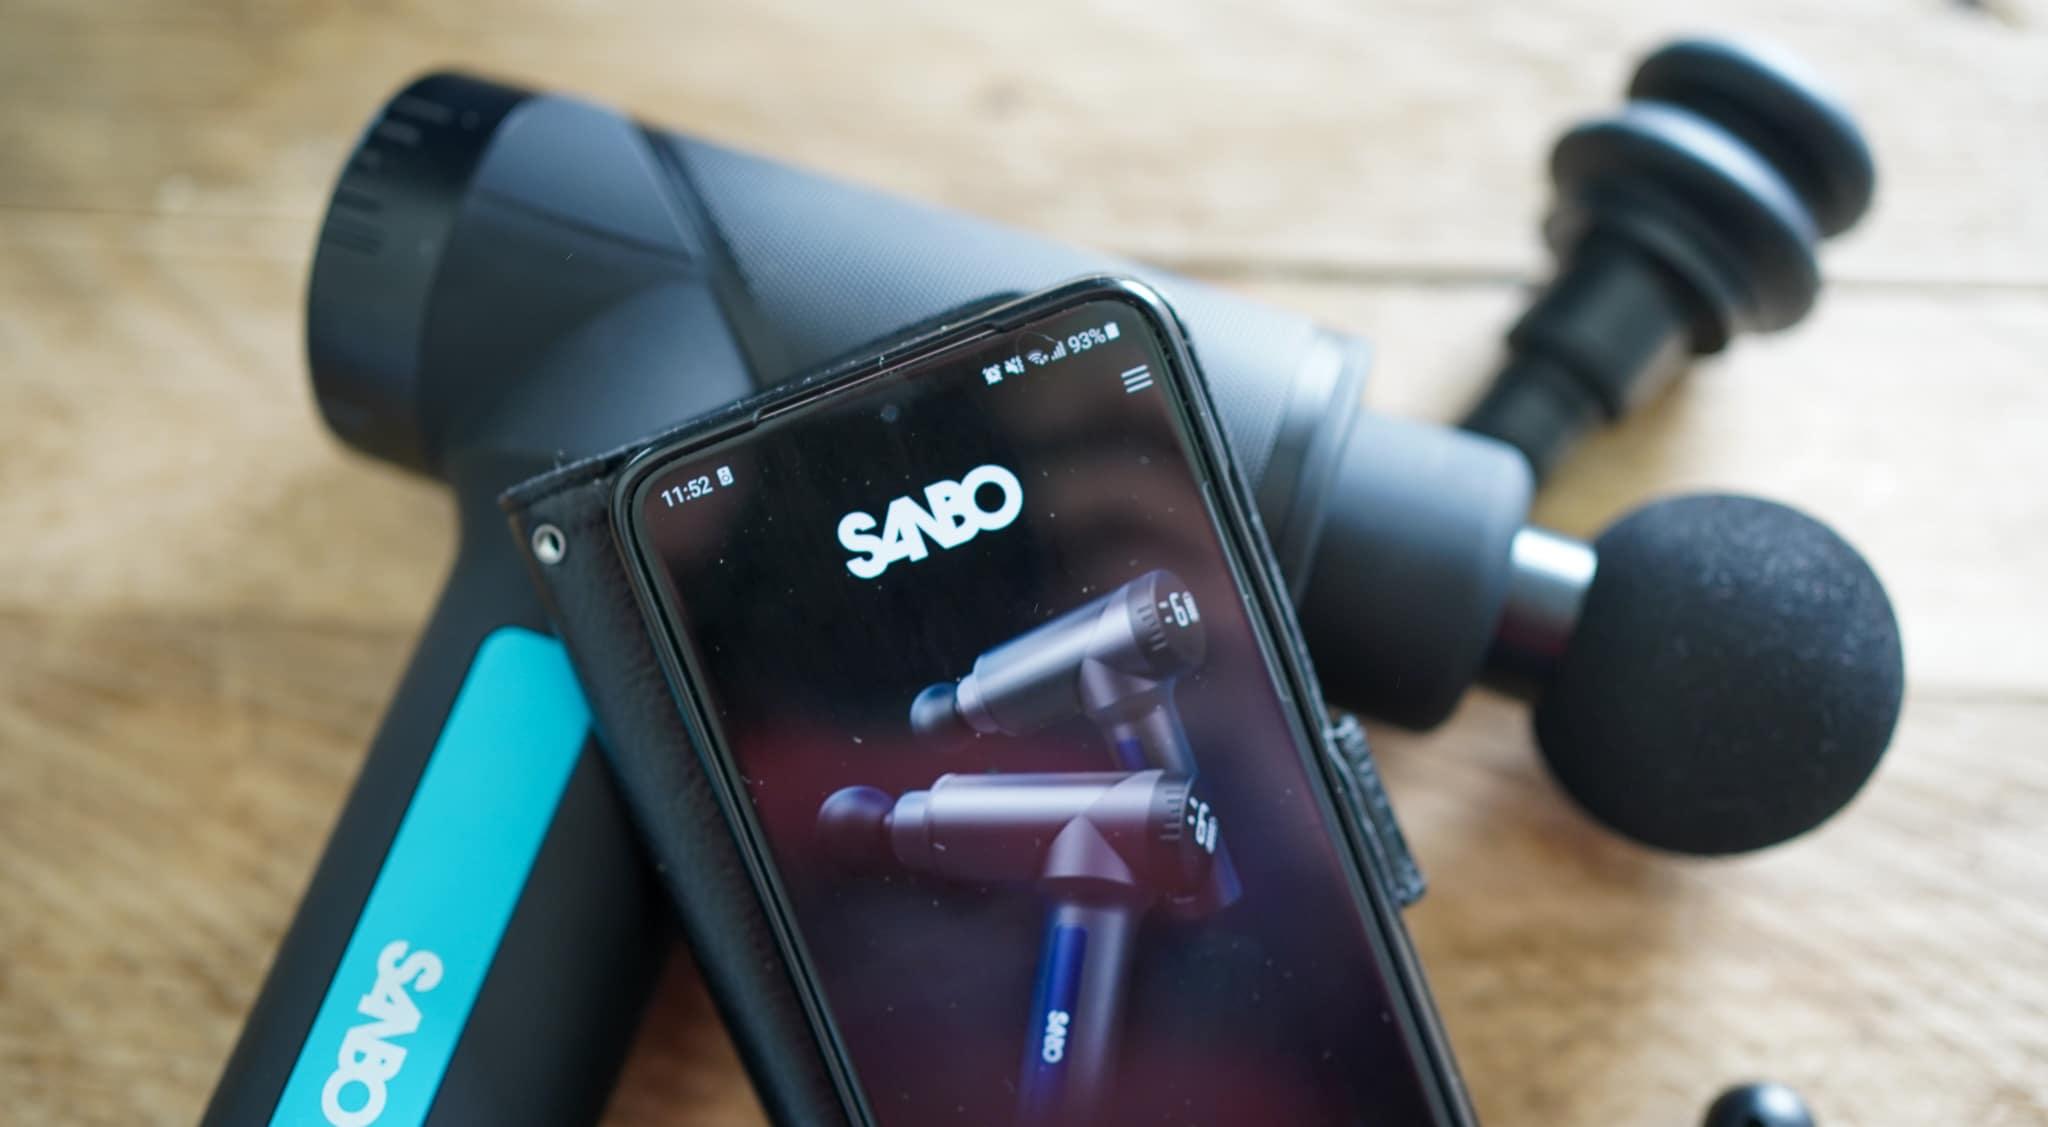 Sanbo-app-massage-gun